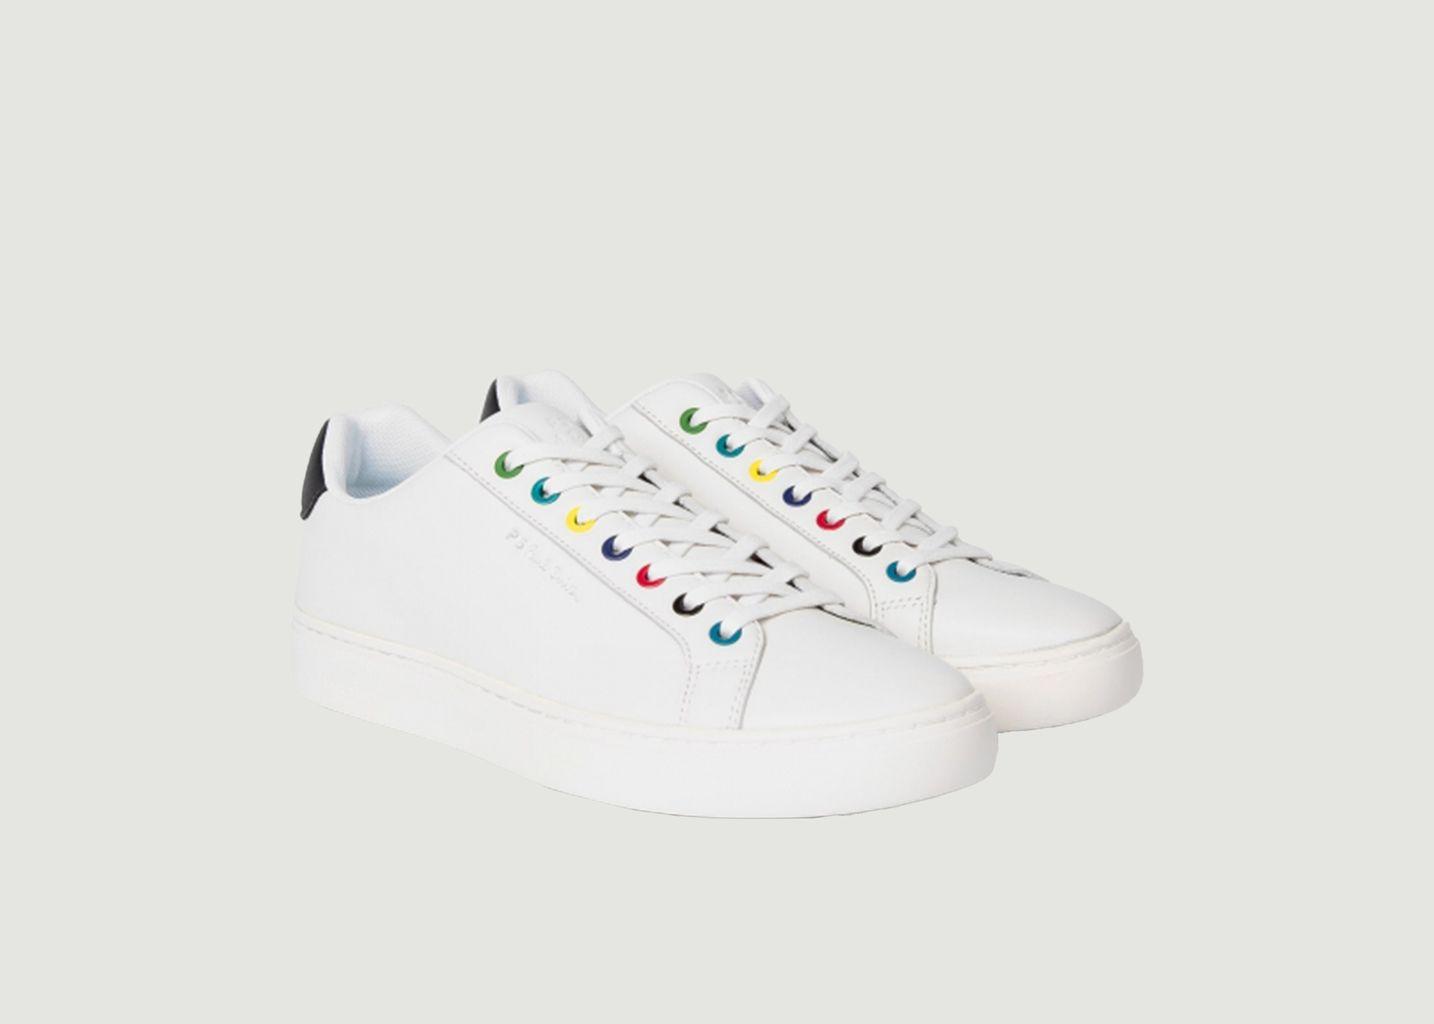 Sneakers en cuir avec œillets multicolores Rex - PS by PAUL SMITH